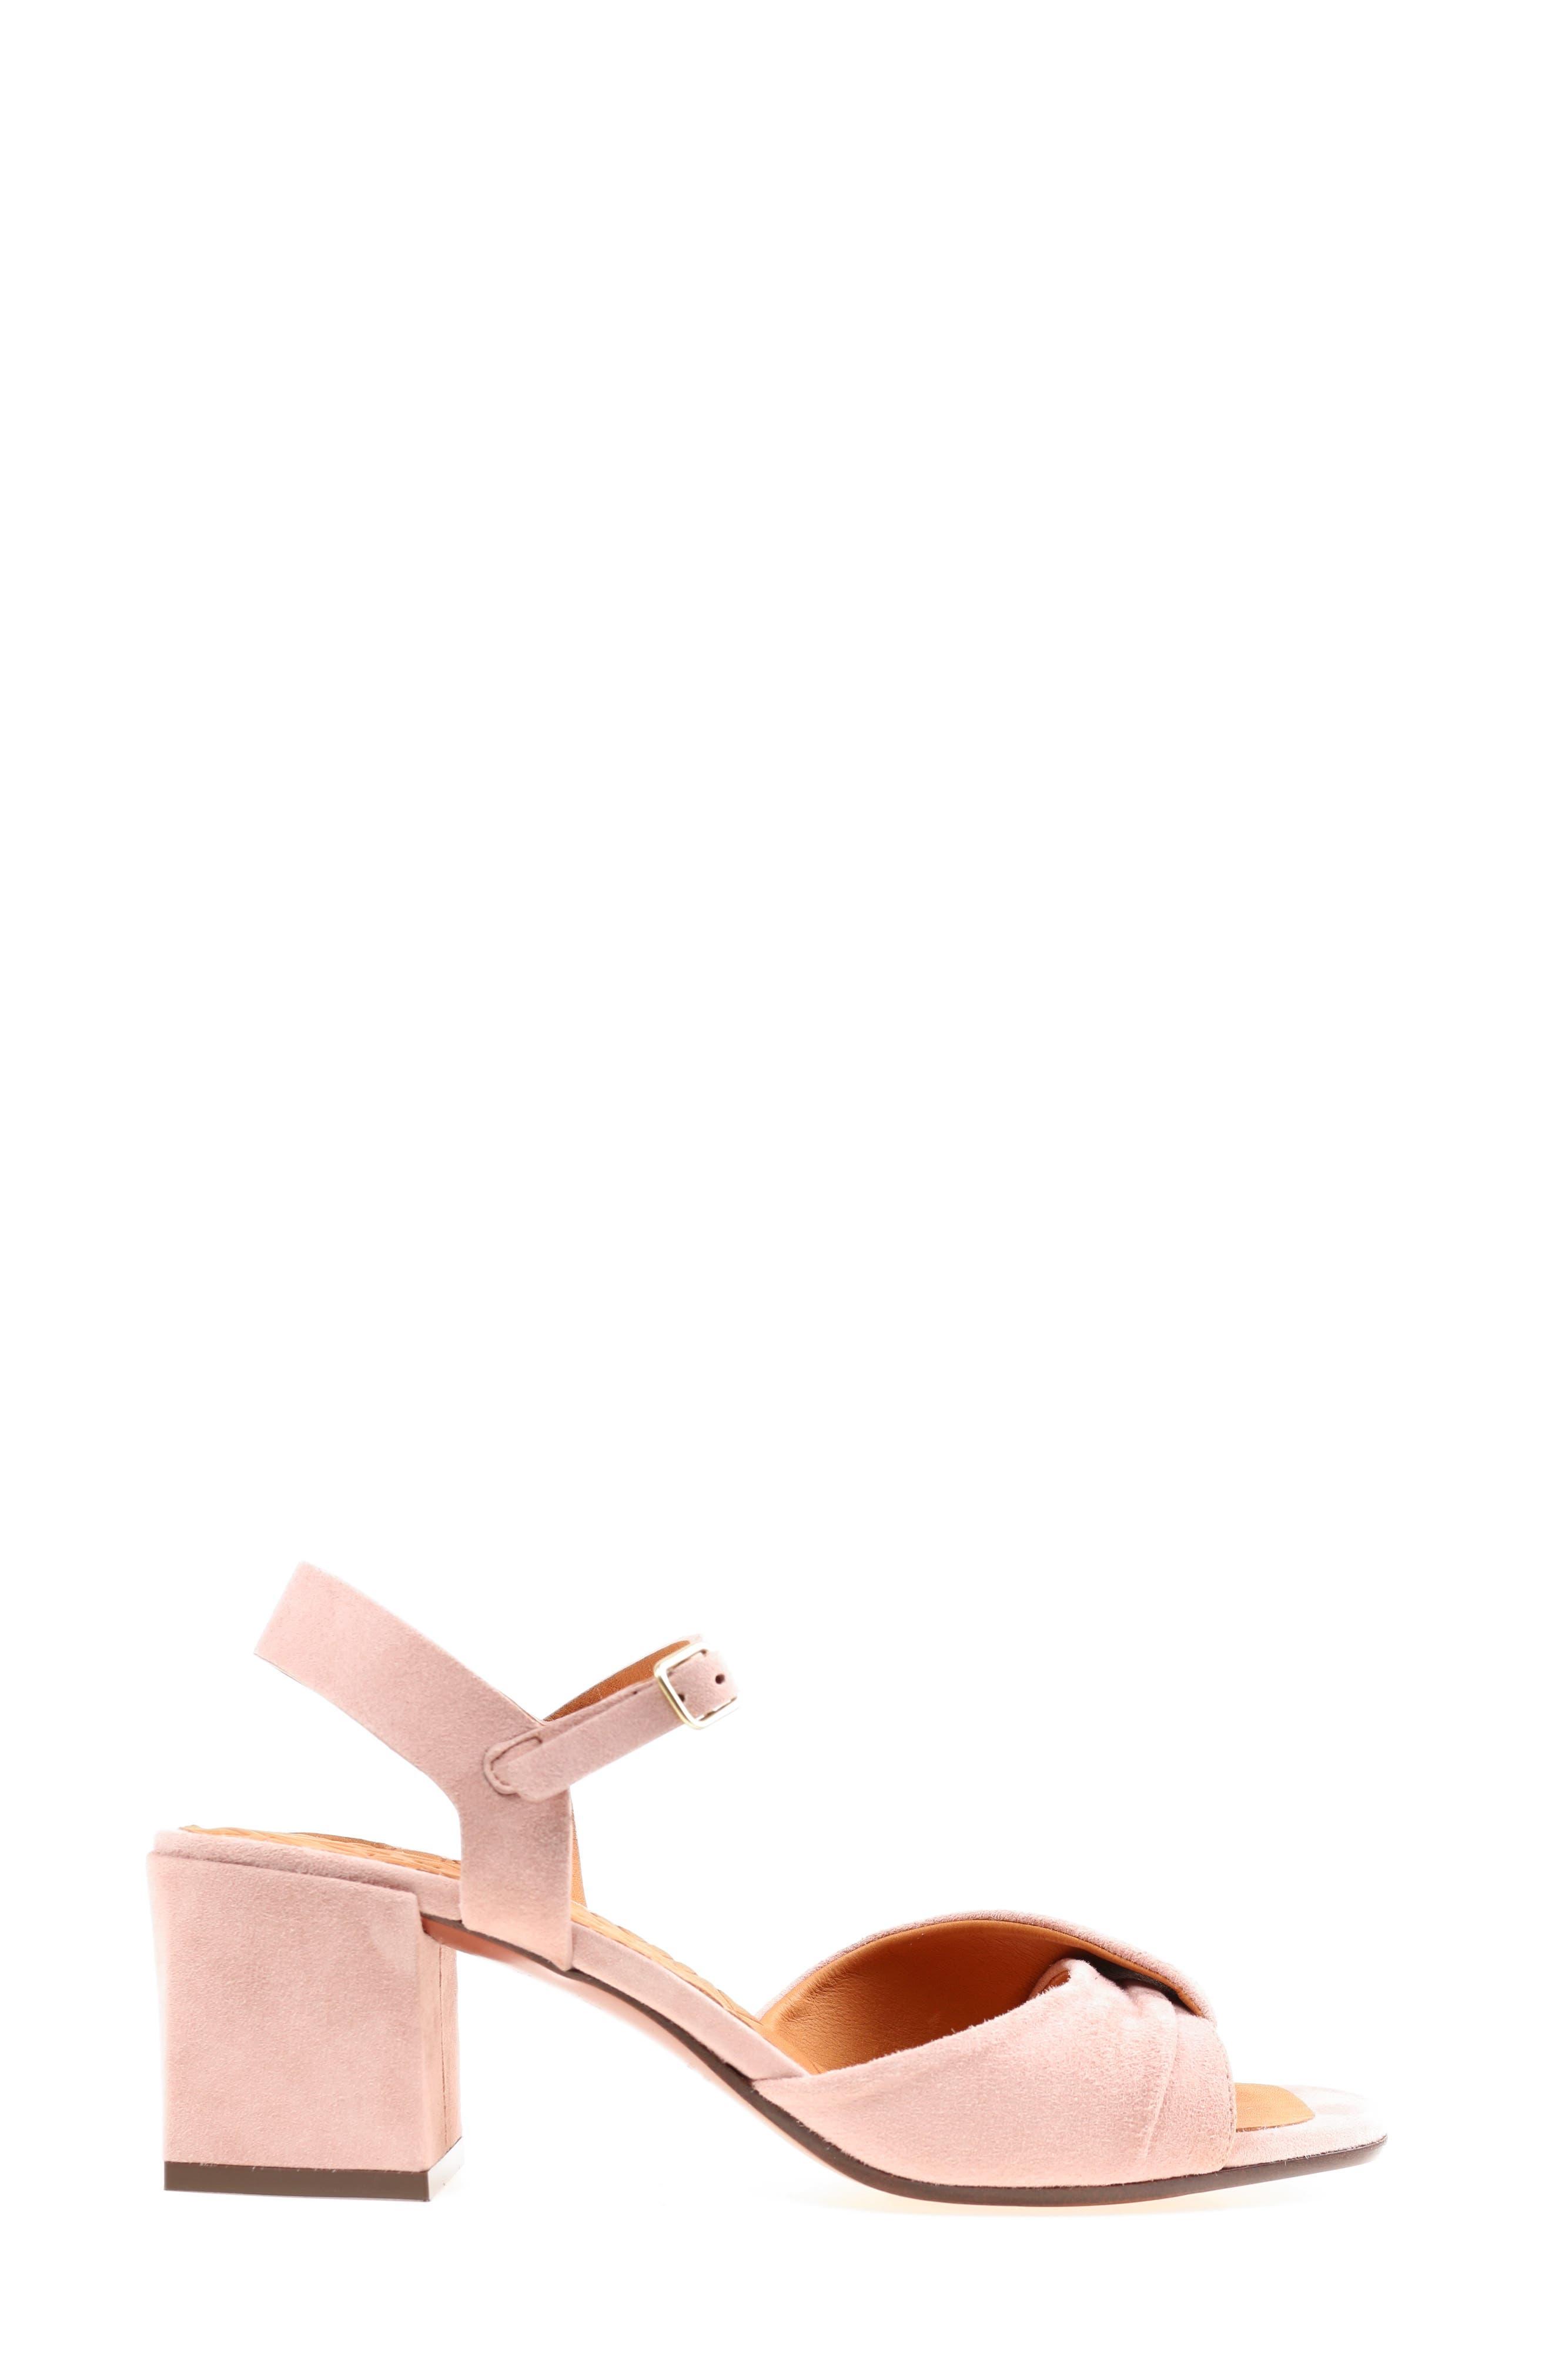 Alternate Image 3  - Chie Mihara Leli Sandal (Women)